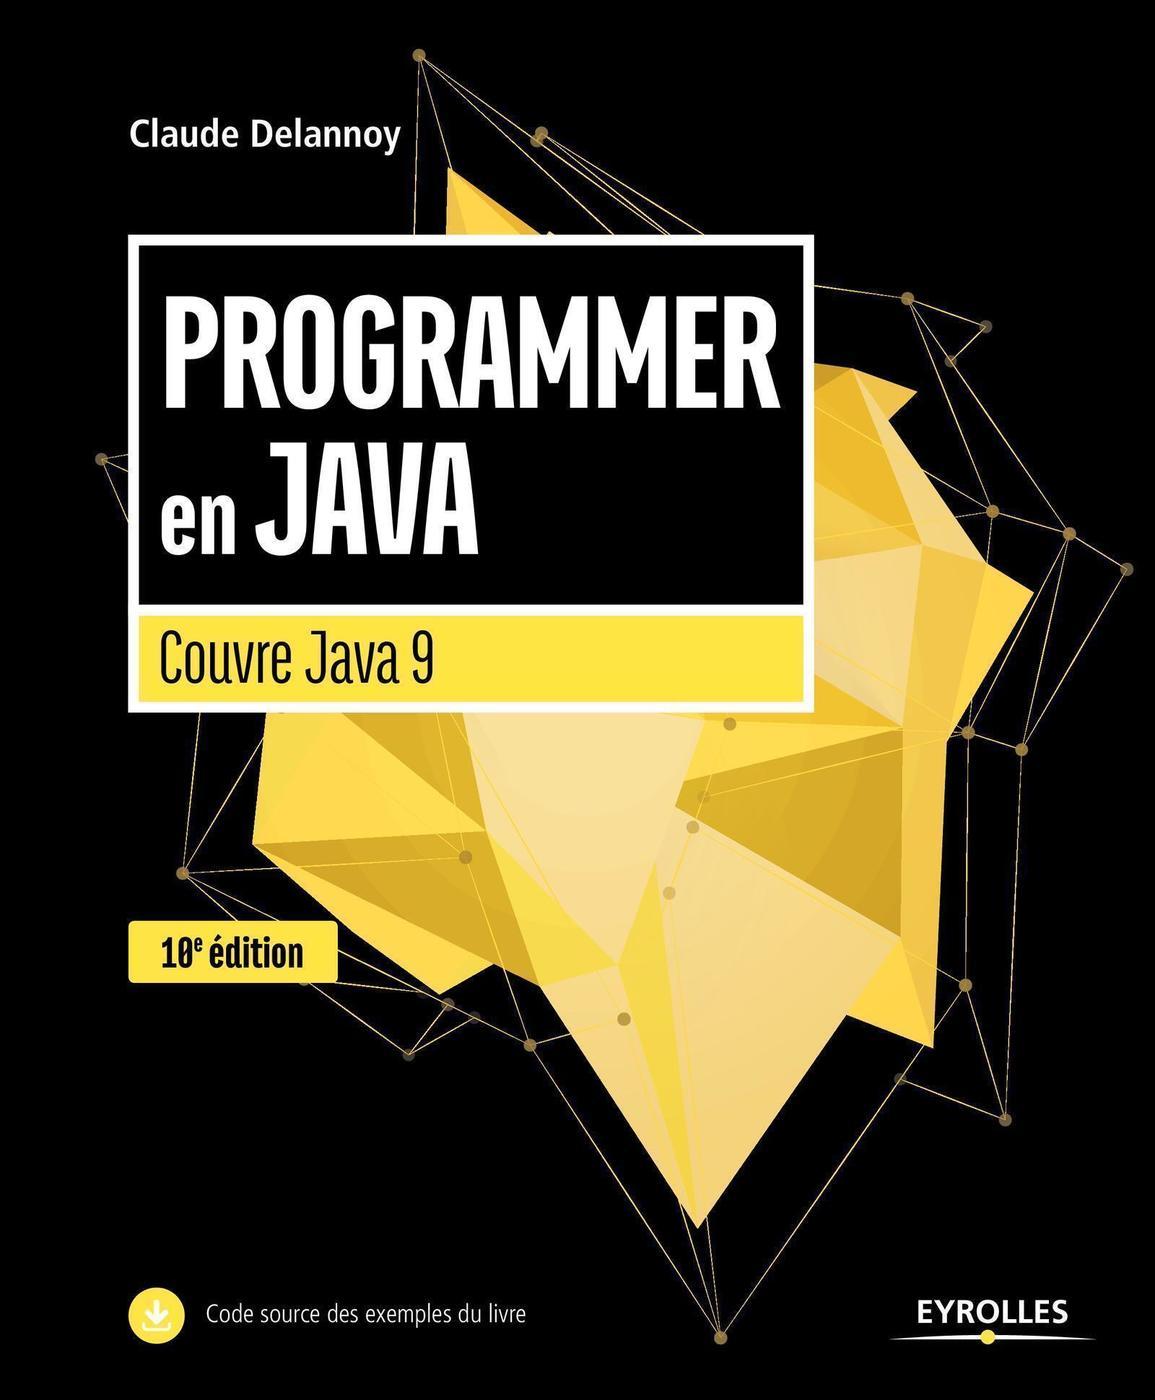 Programmer En Java Couvre Java 9 C Delannoy 10eme Edition Librairie Eyrolles